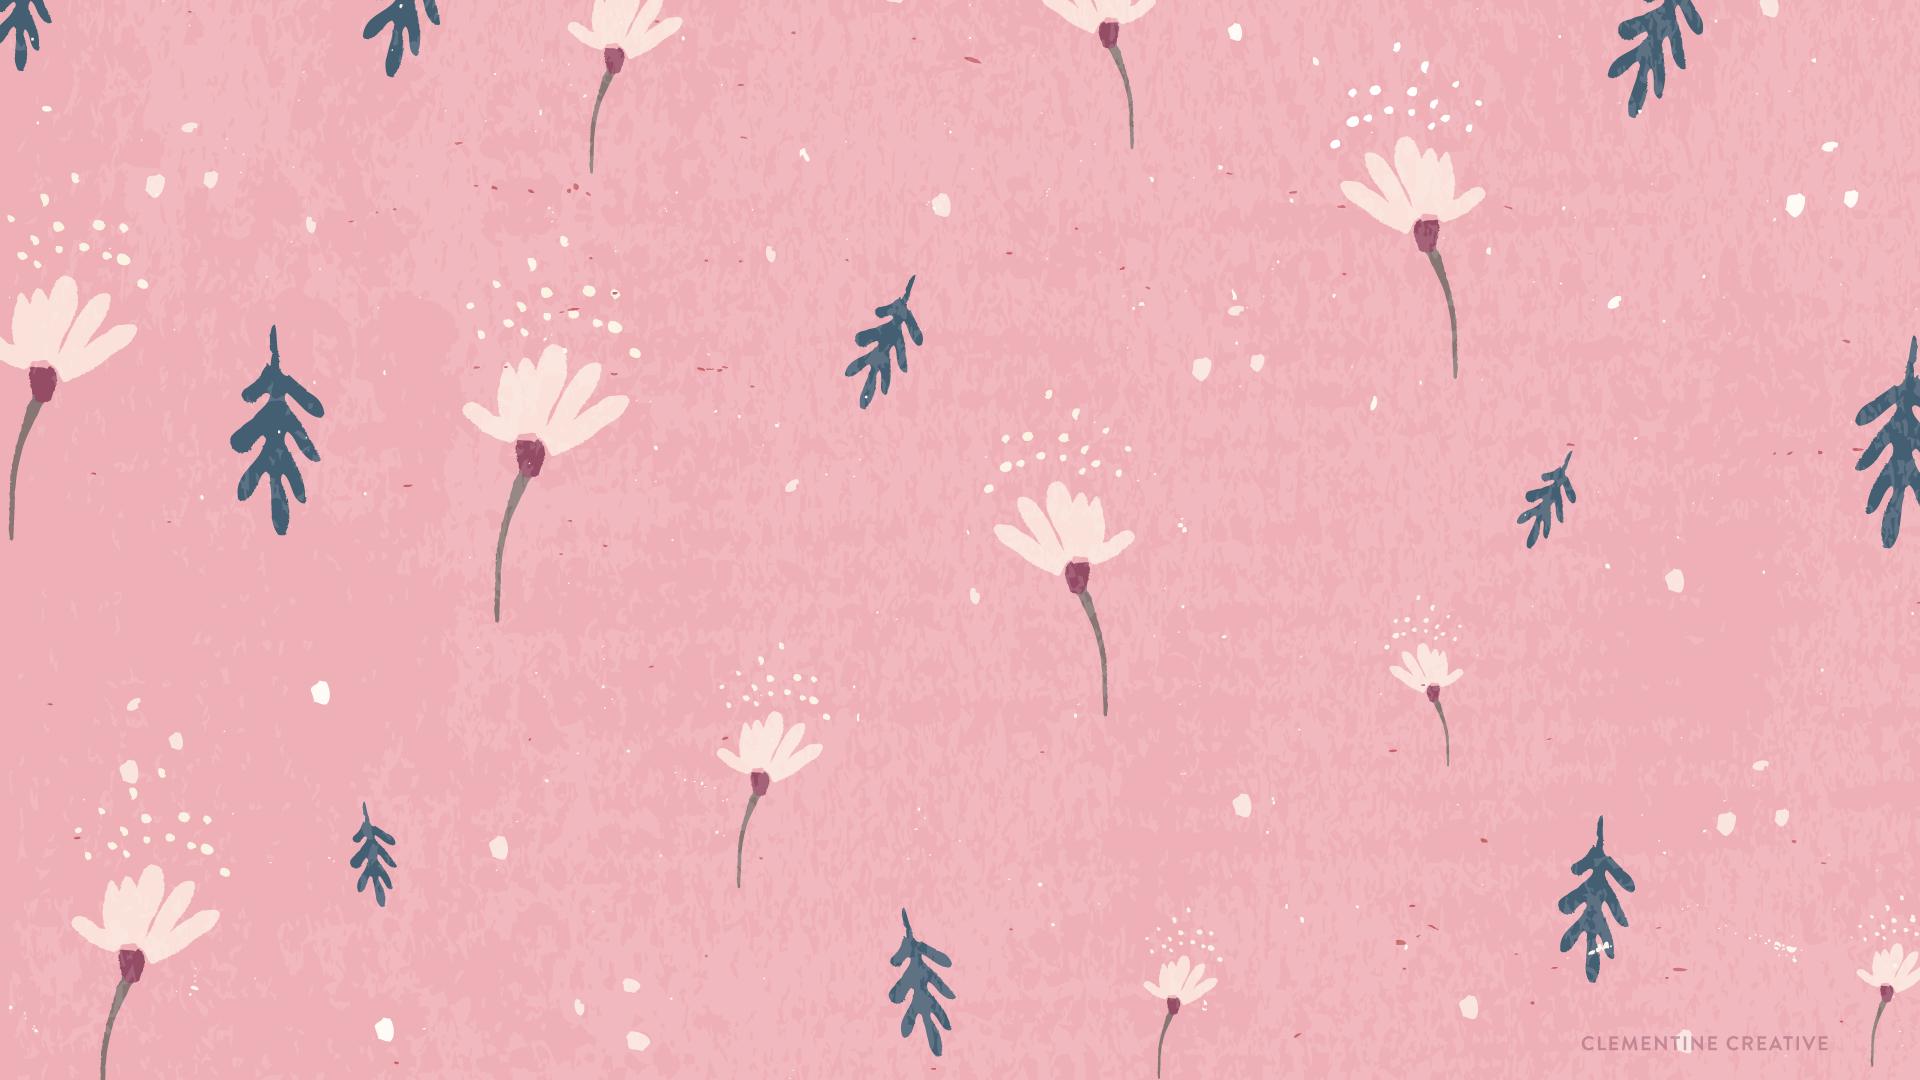 Free Wallpaper Dainty Falling Flowers I N S P I R E Pink Wa Pink Wallpaper Desktop Macbook Wallpaper Pink Wallpaper